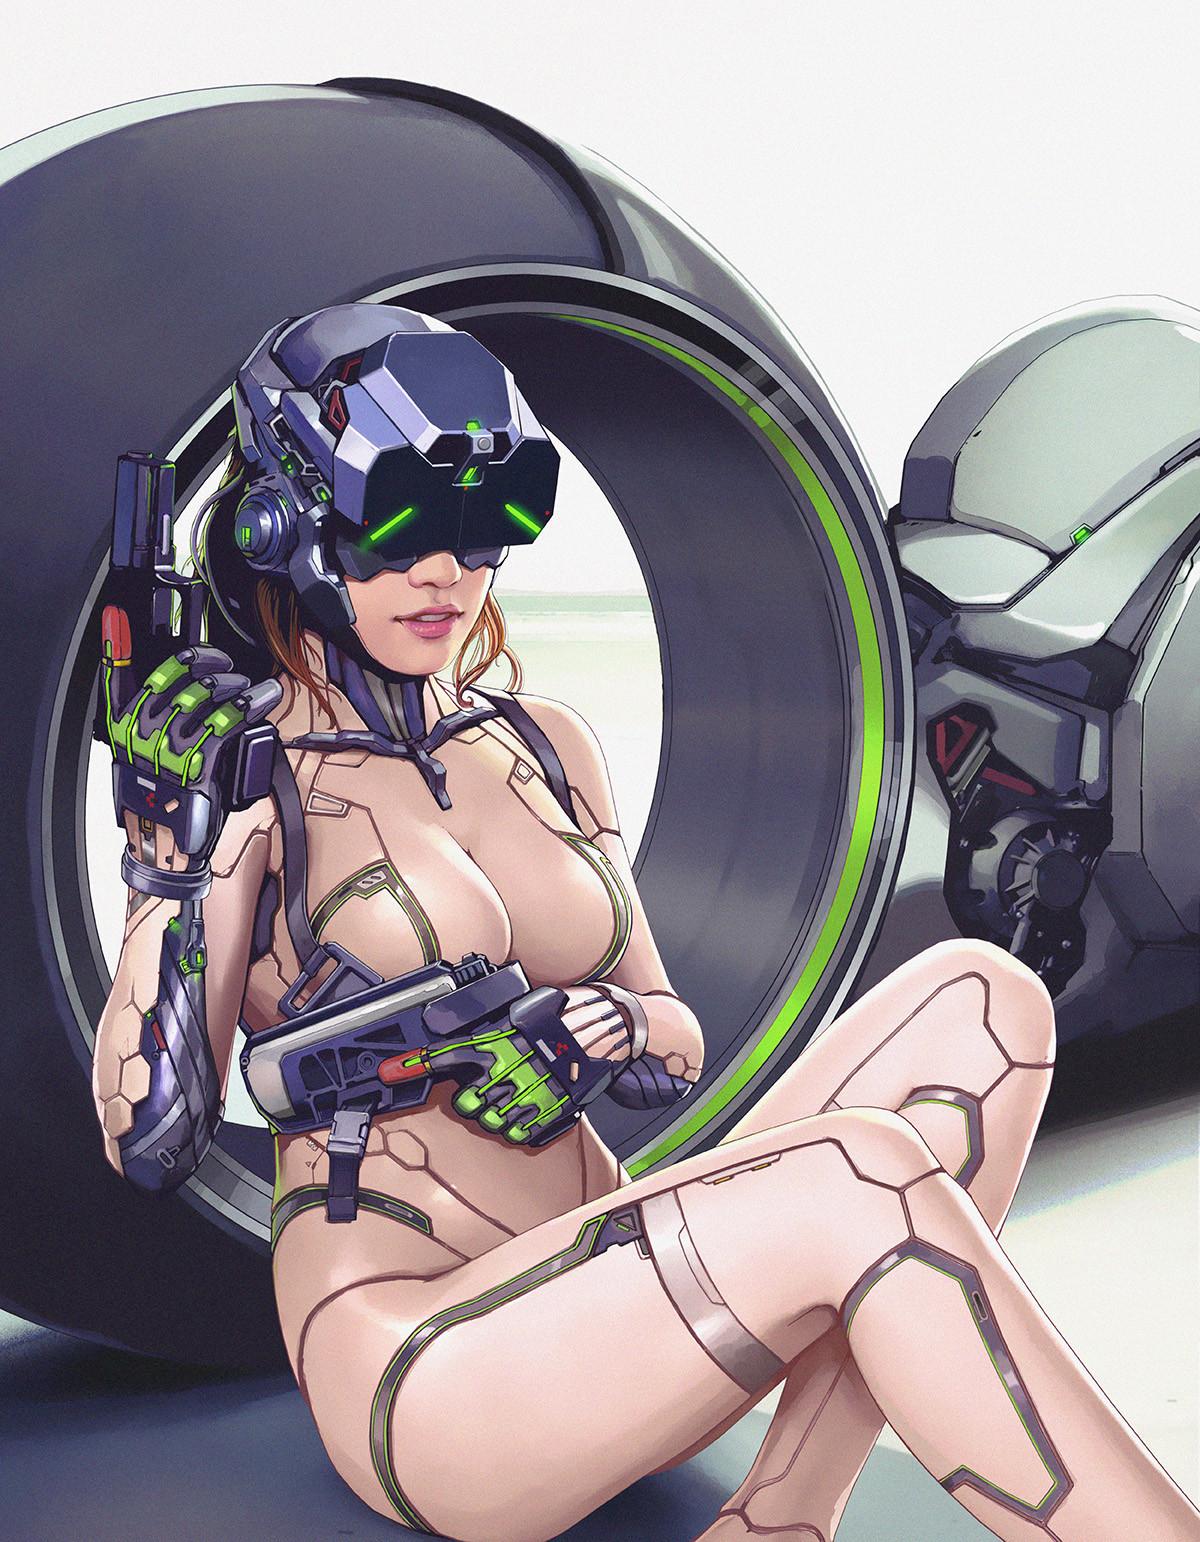 Yulin Li